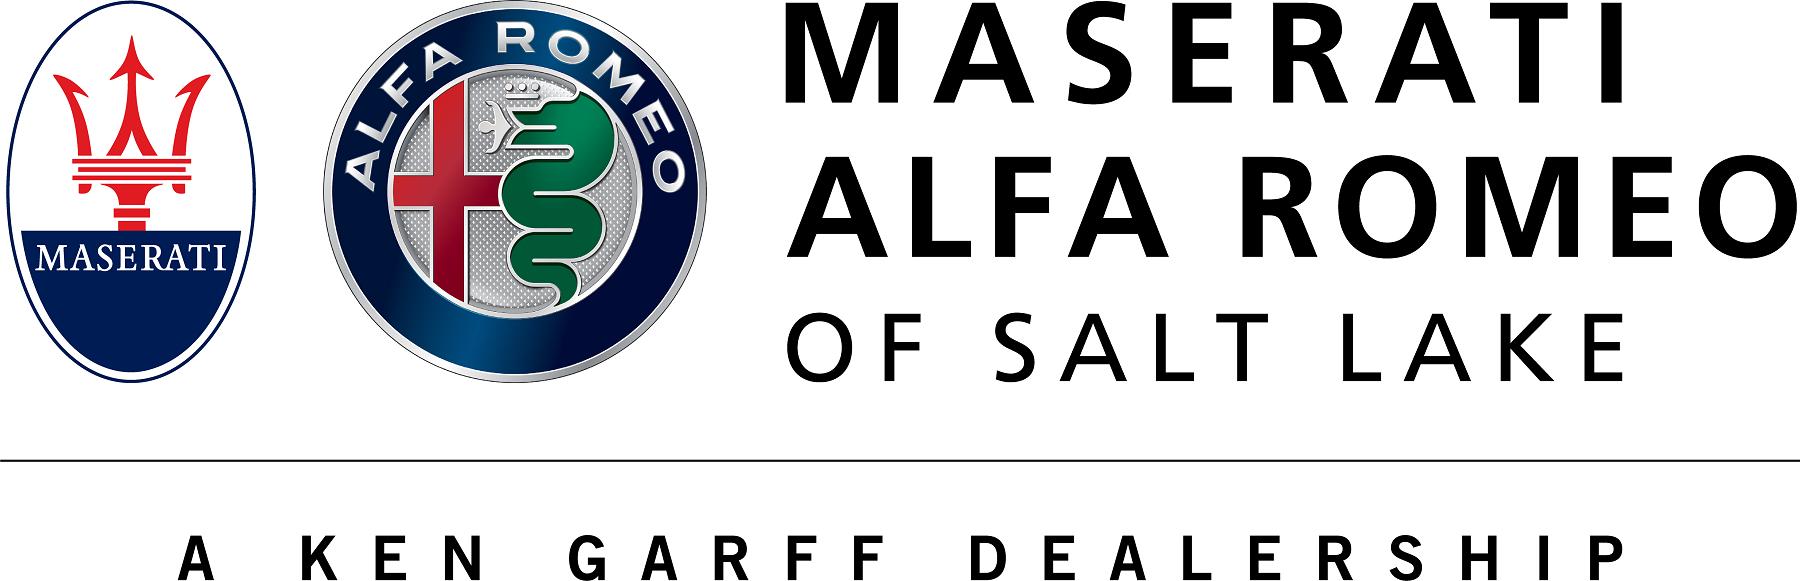 Maserati of Salt Lake City